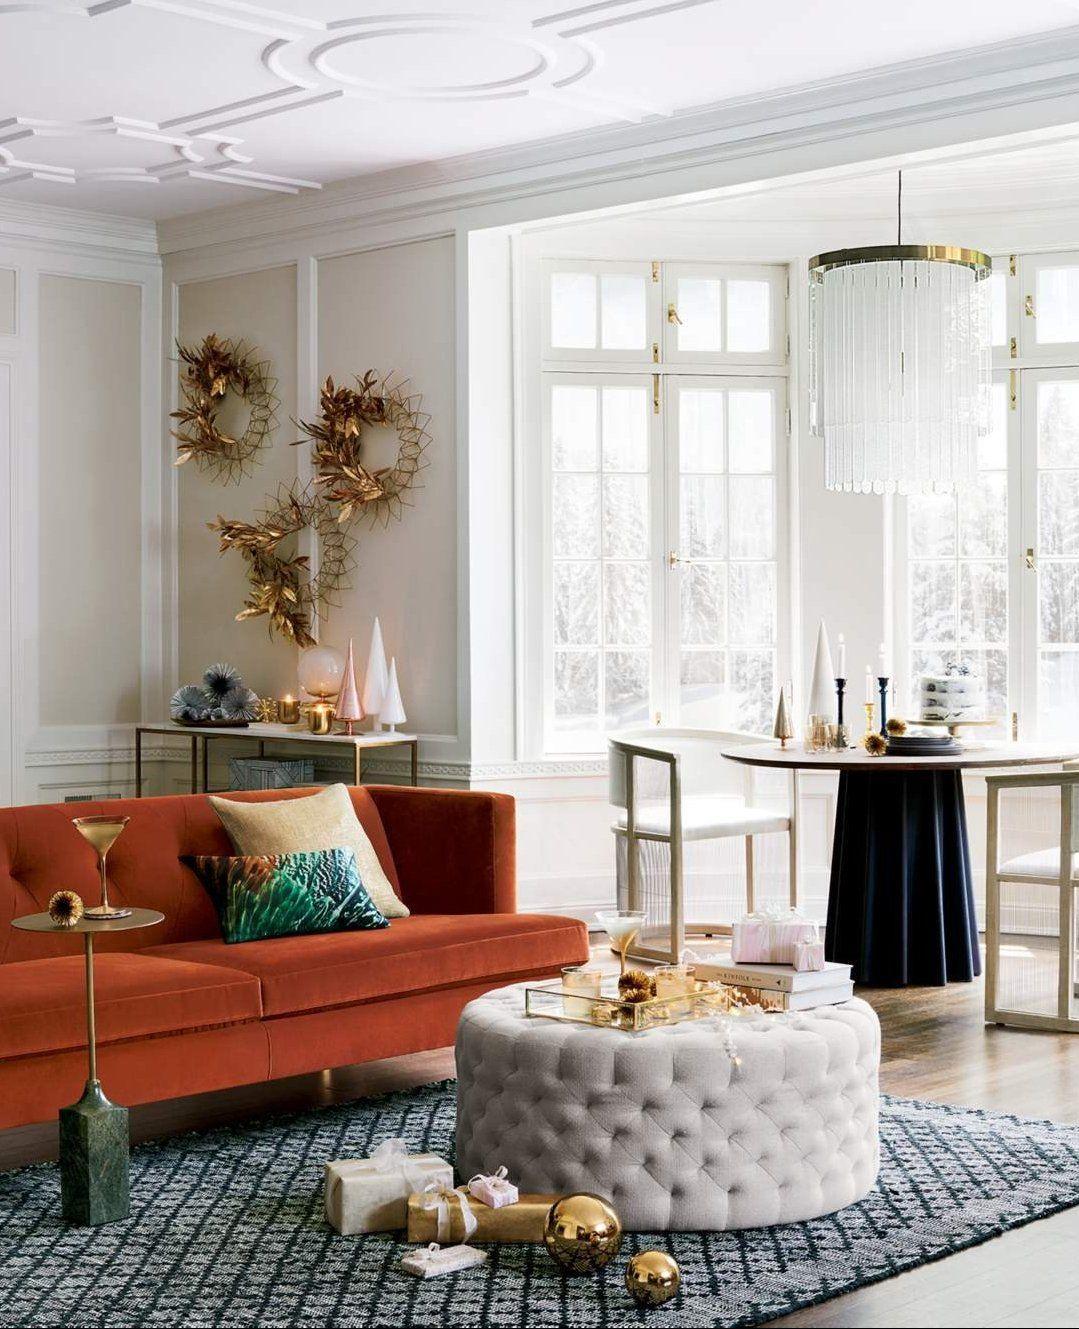 Natural Round Tufted Ottoman Reviews Elegant Living Room Decor